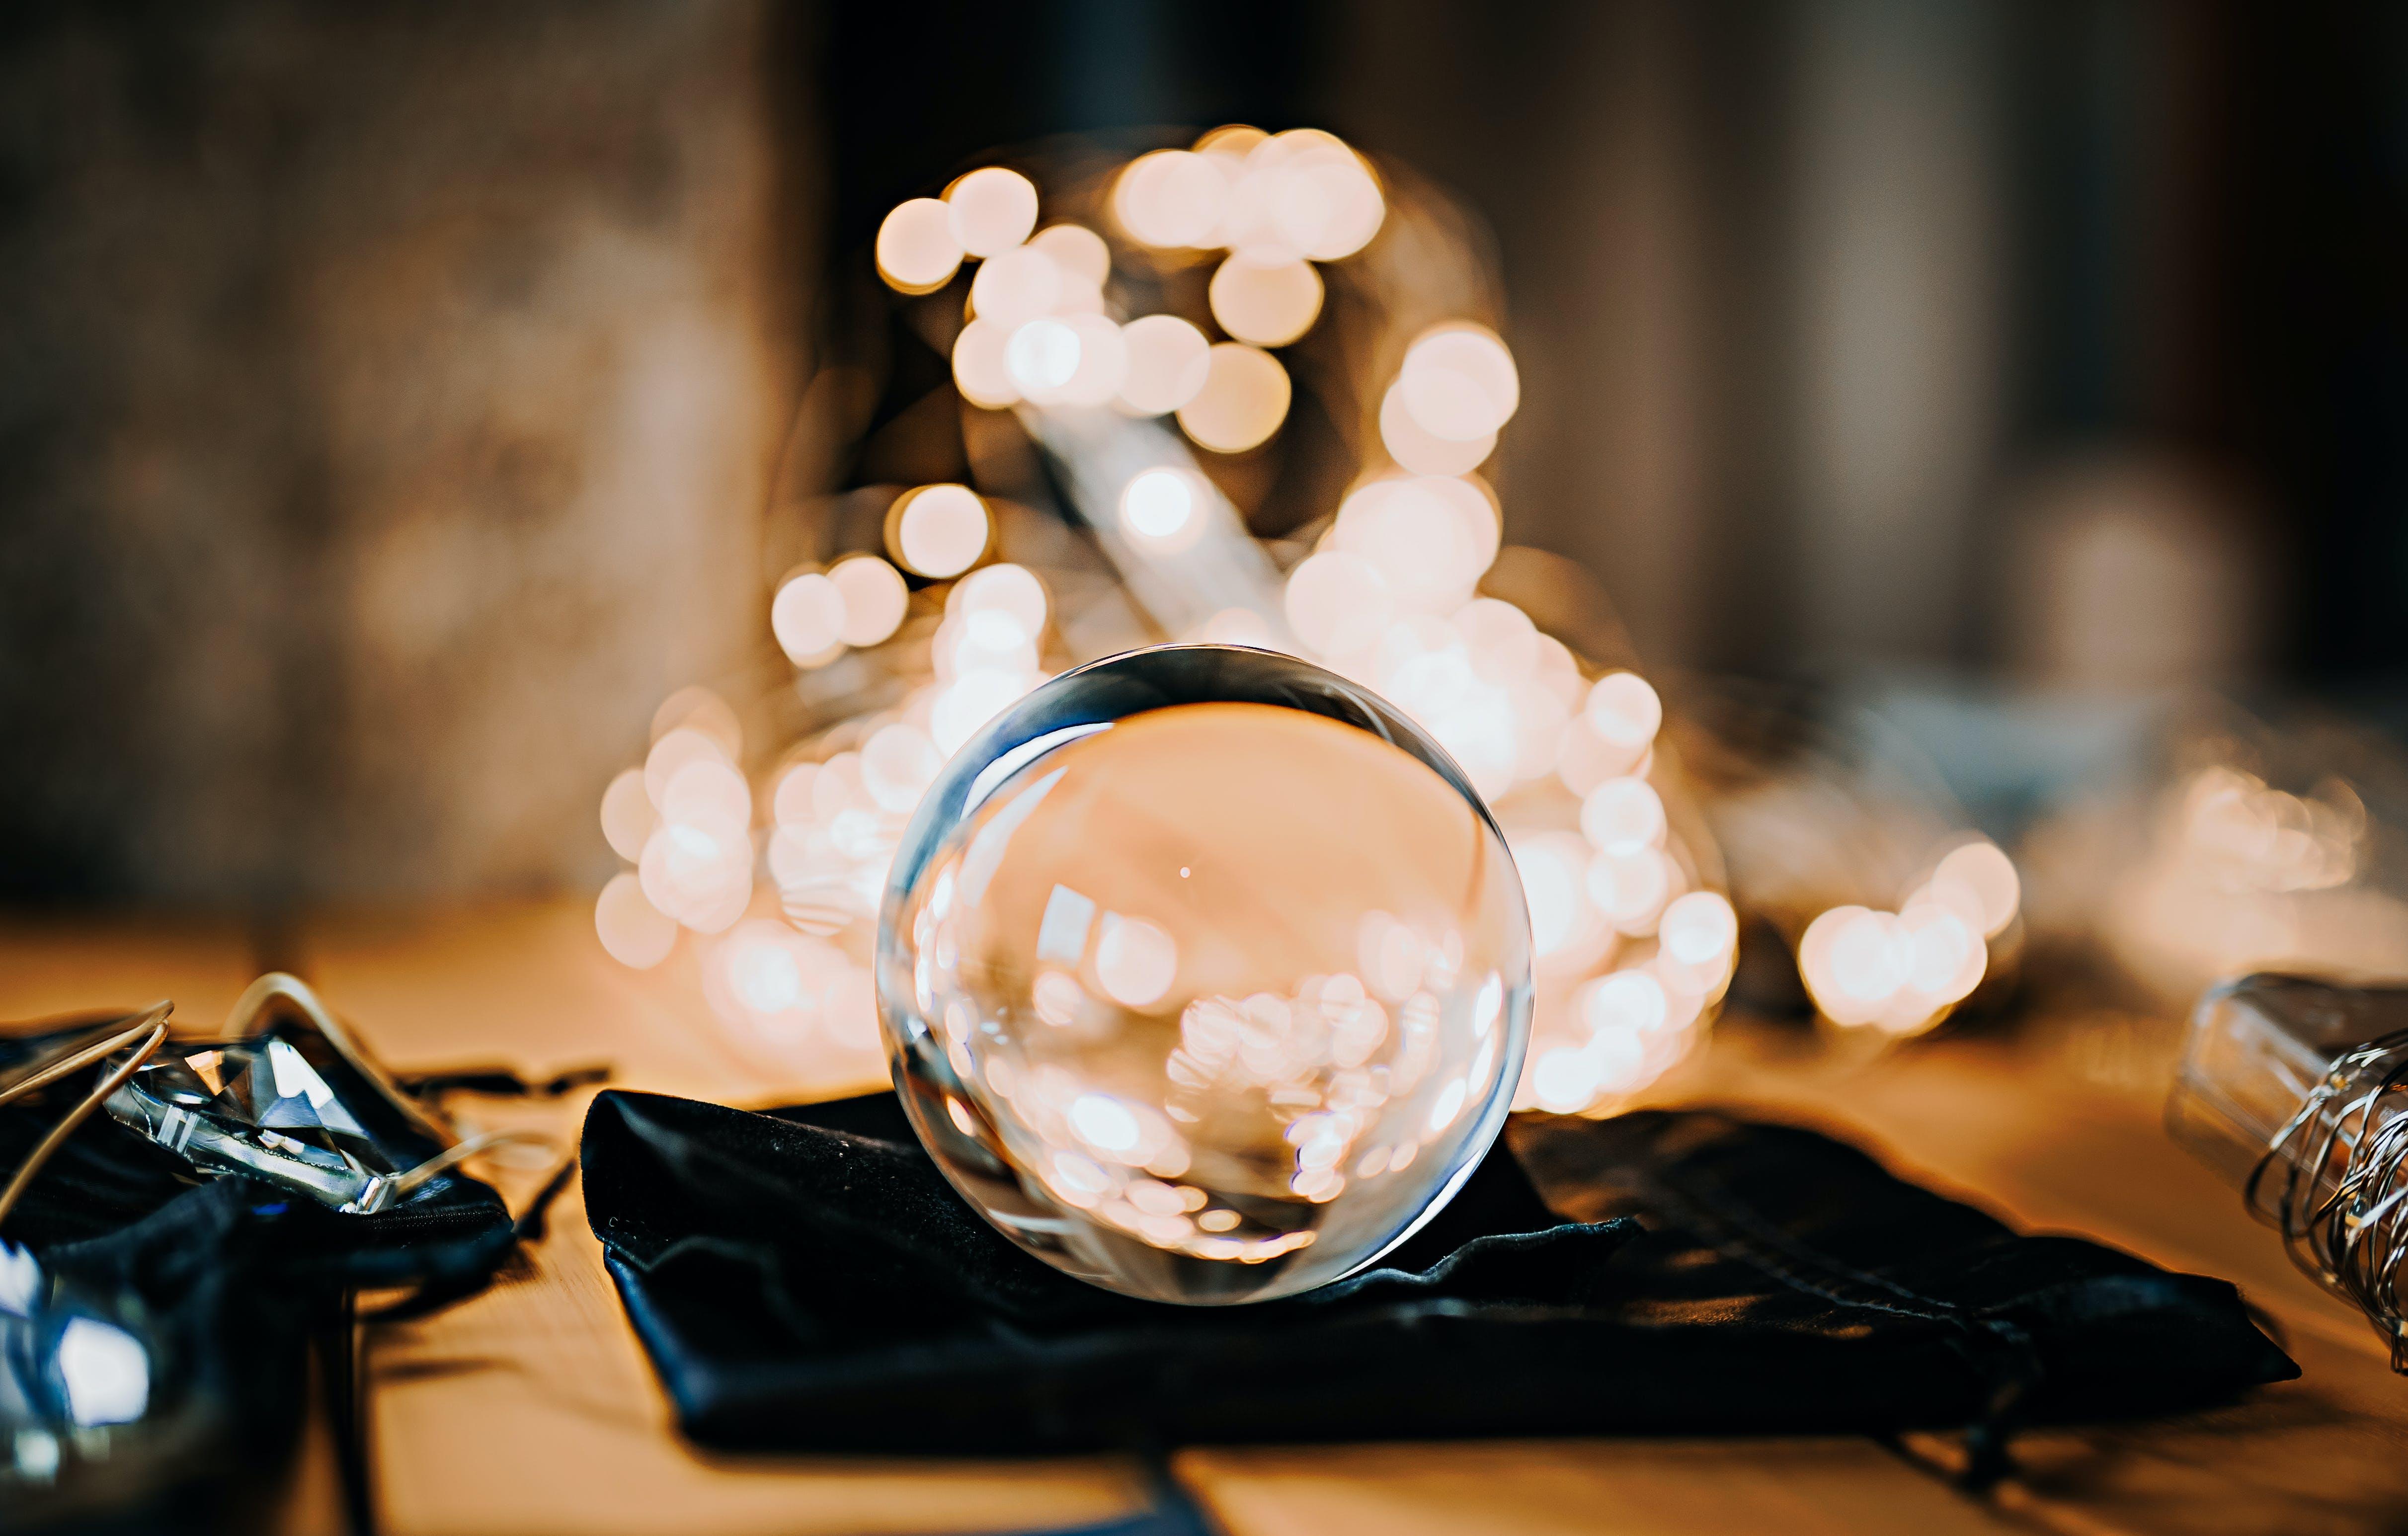 Kostenloses Stock Foto zu glas, glaskugel, lensball, makro